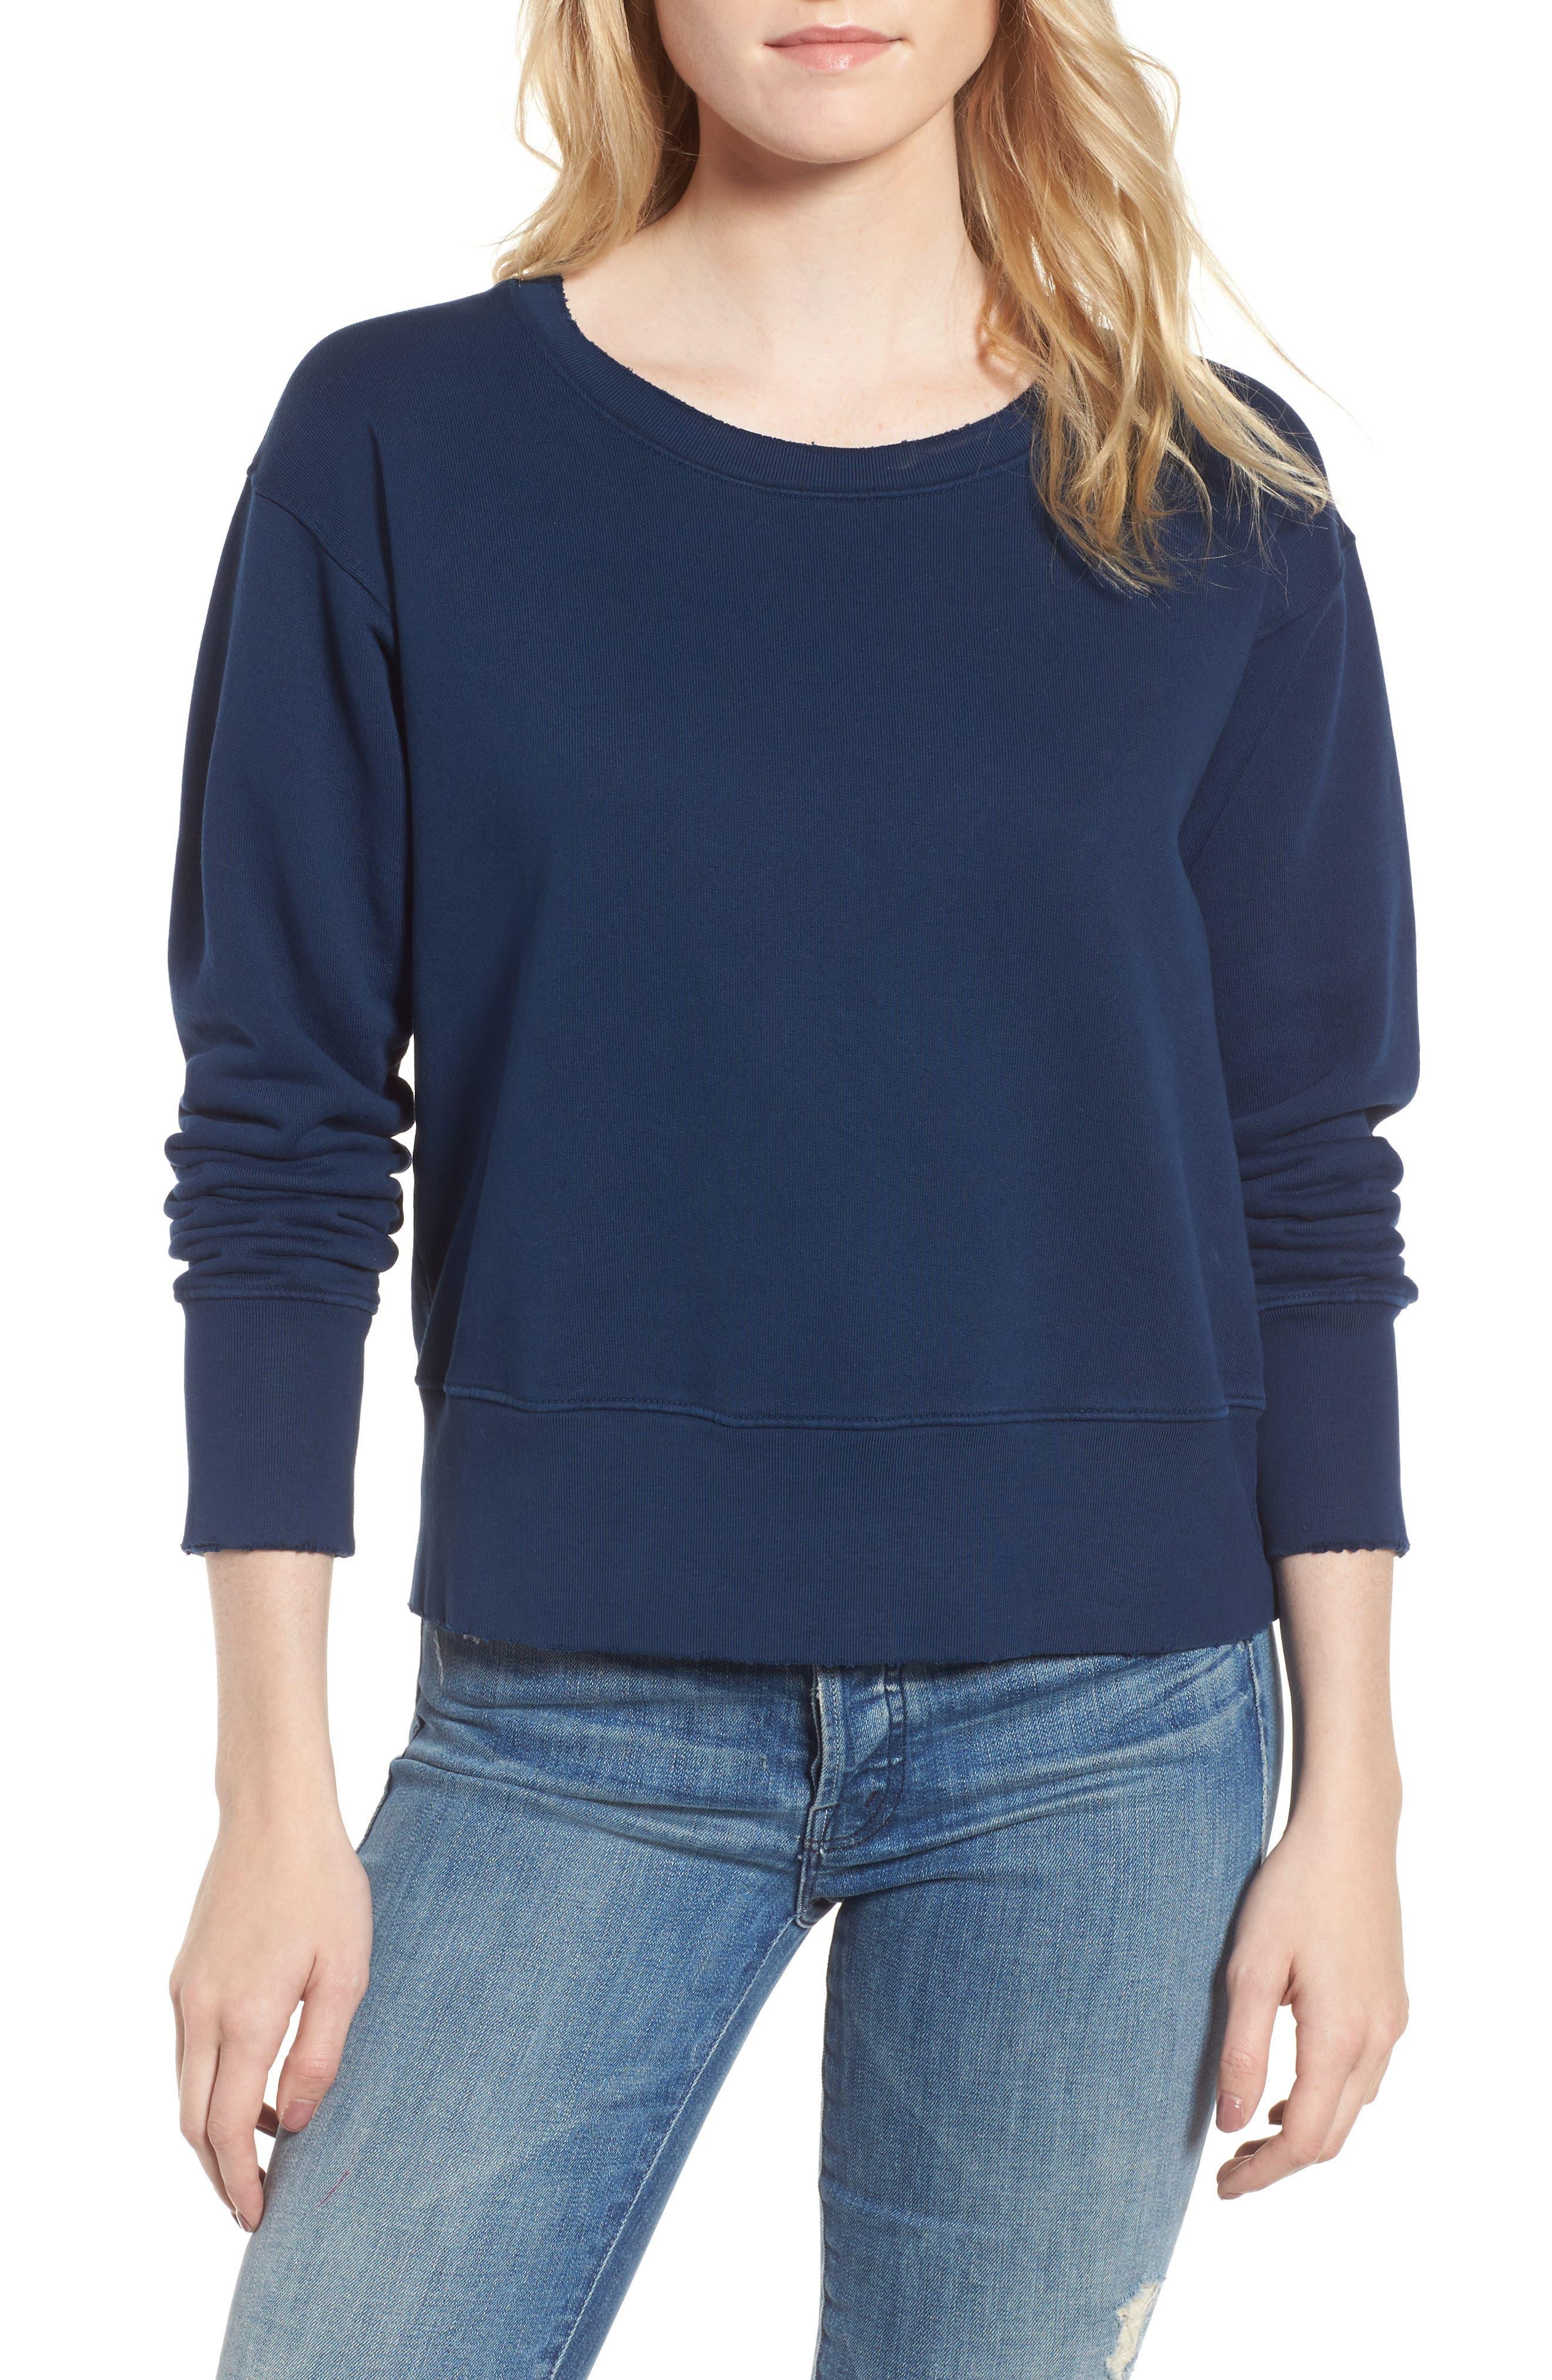 Main Image - Frank & Eileen Tee Lab Distressed Sweatshirt